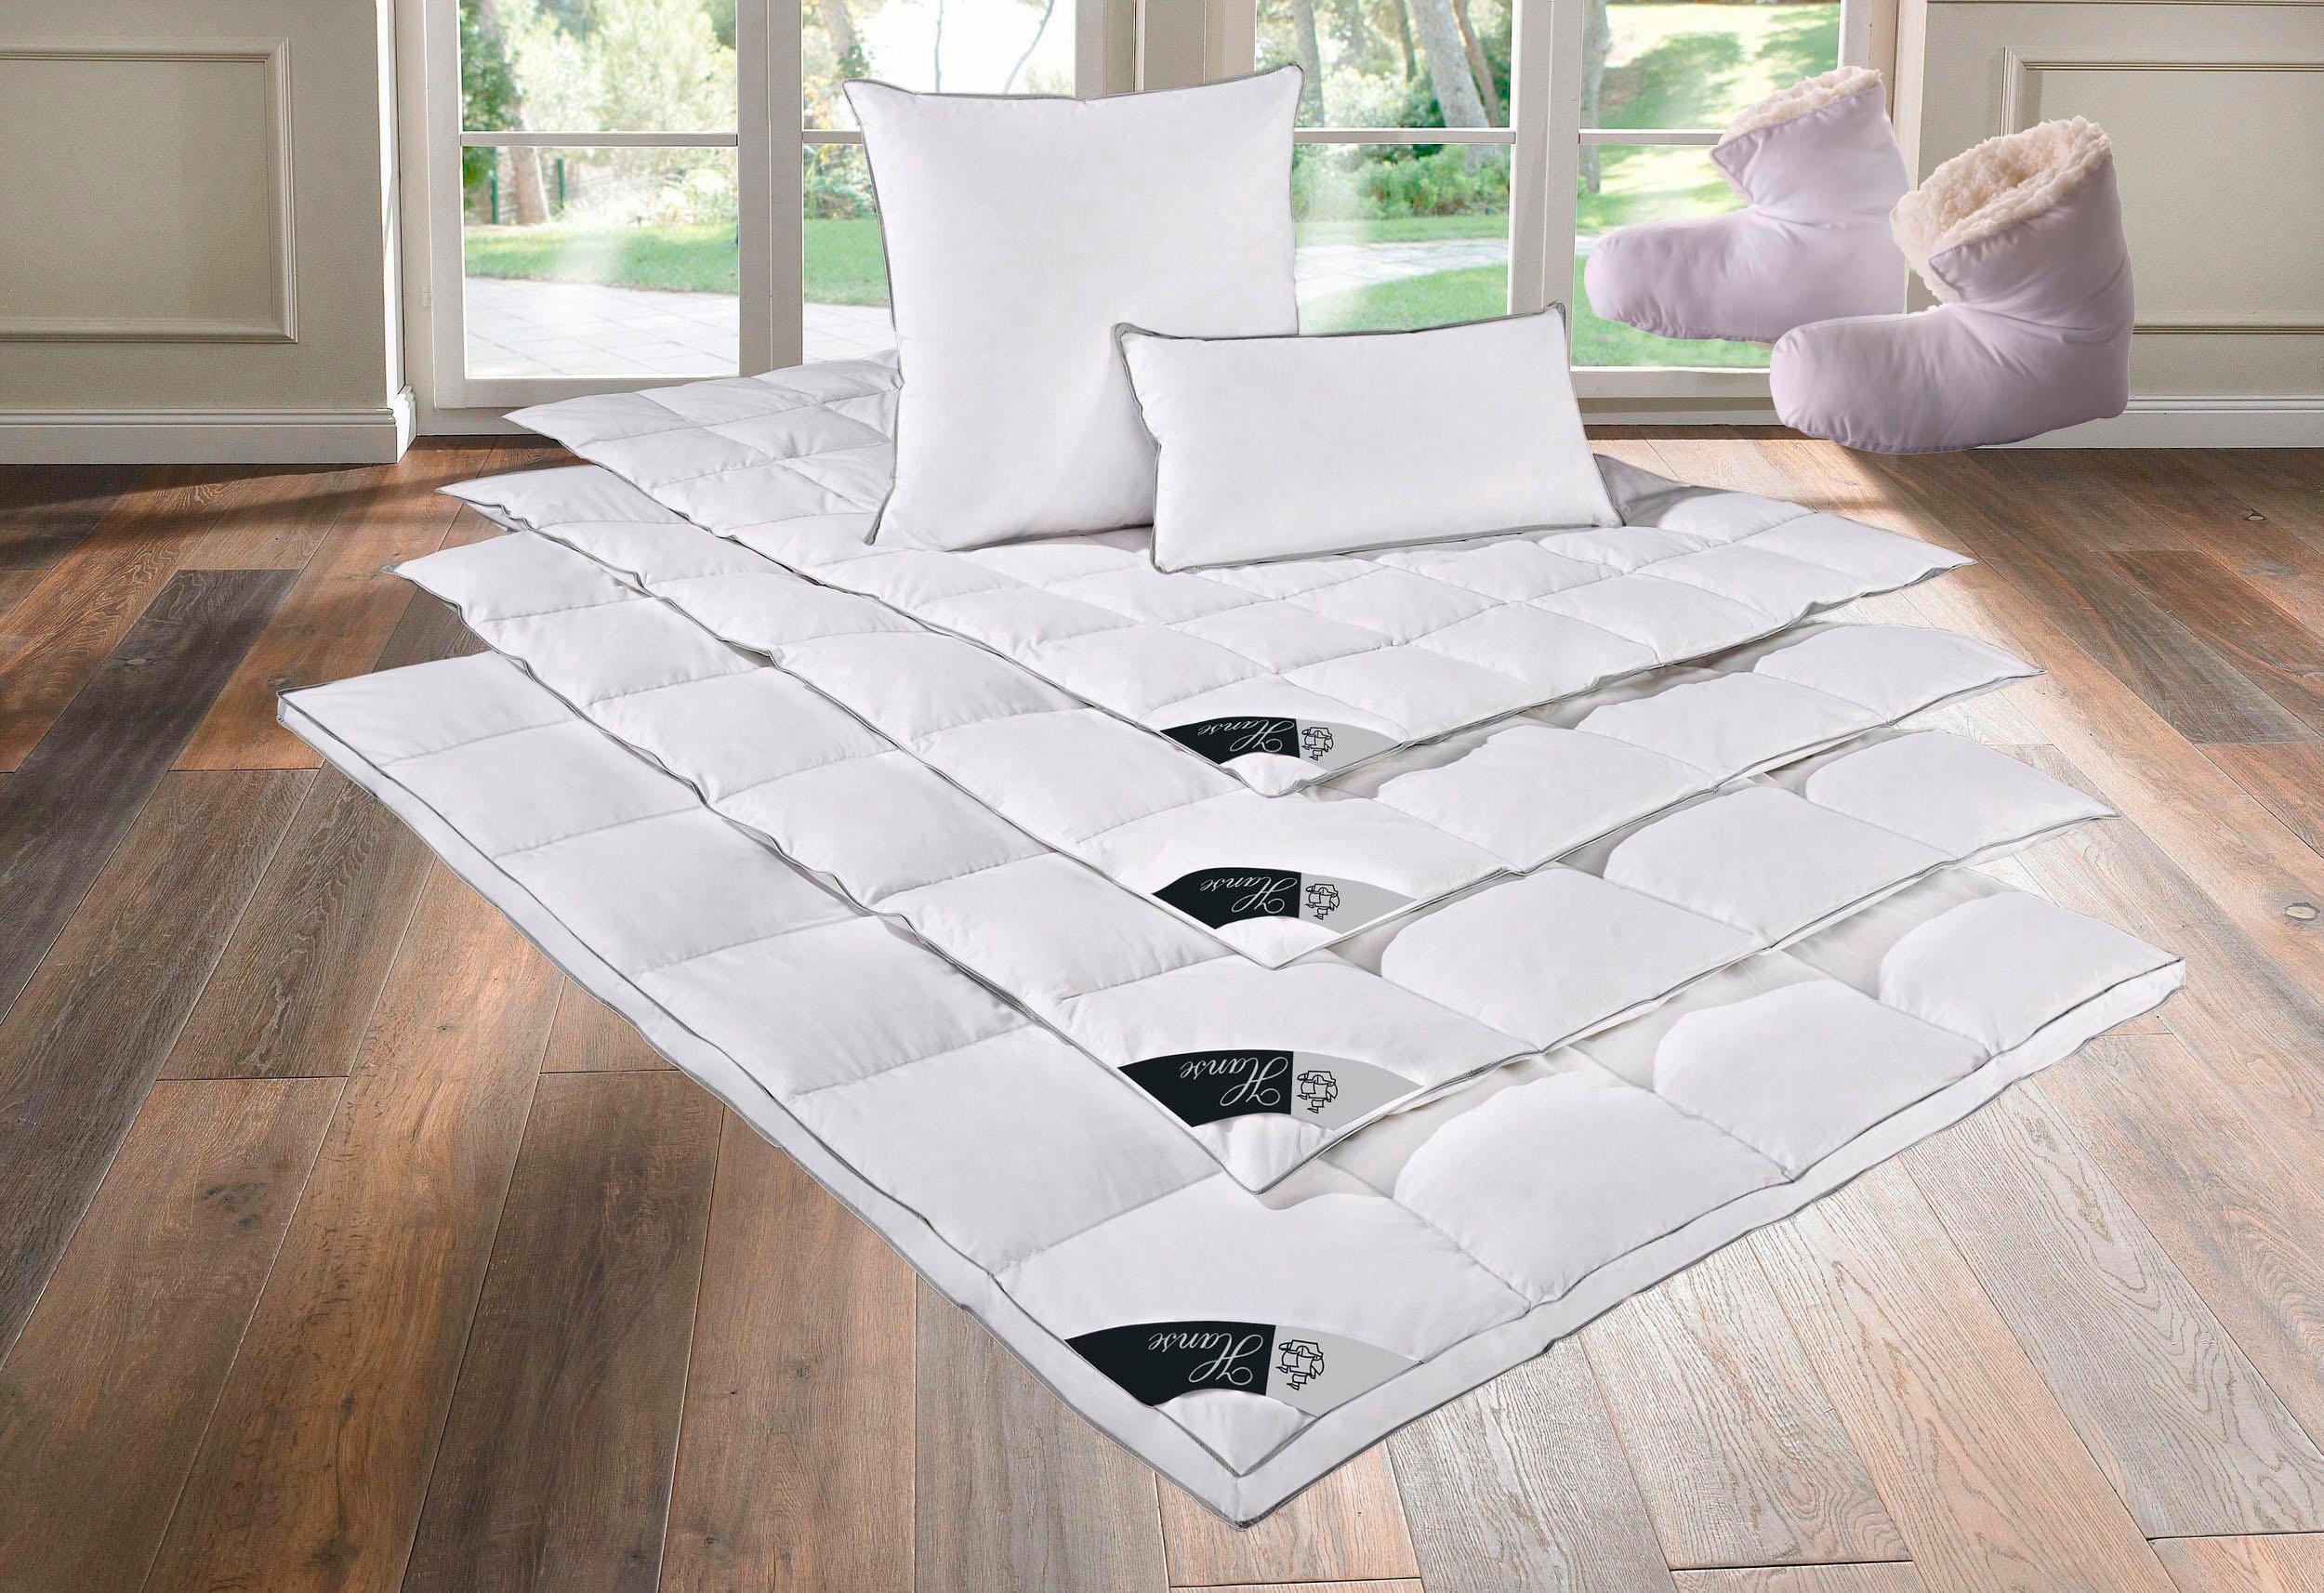 Daunenbettdecke by Ribeco Lea Hanse by RIBECO leicht Füllung: 90% Daunen 10% Federn Bezug: 100% Baumwolle